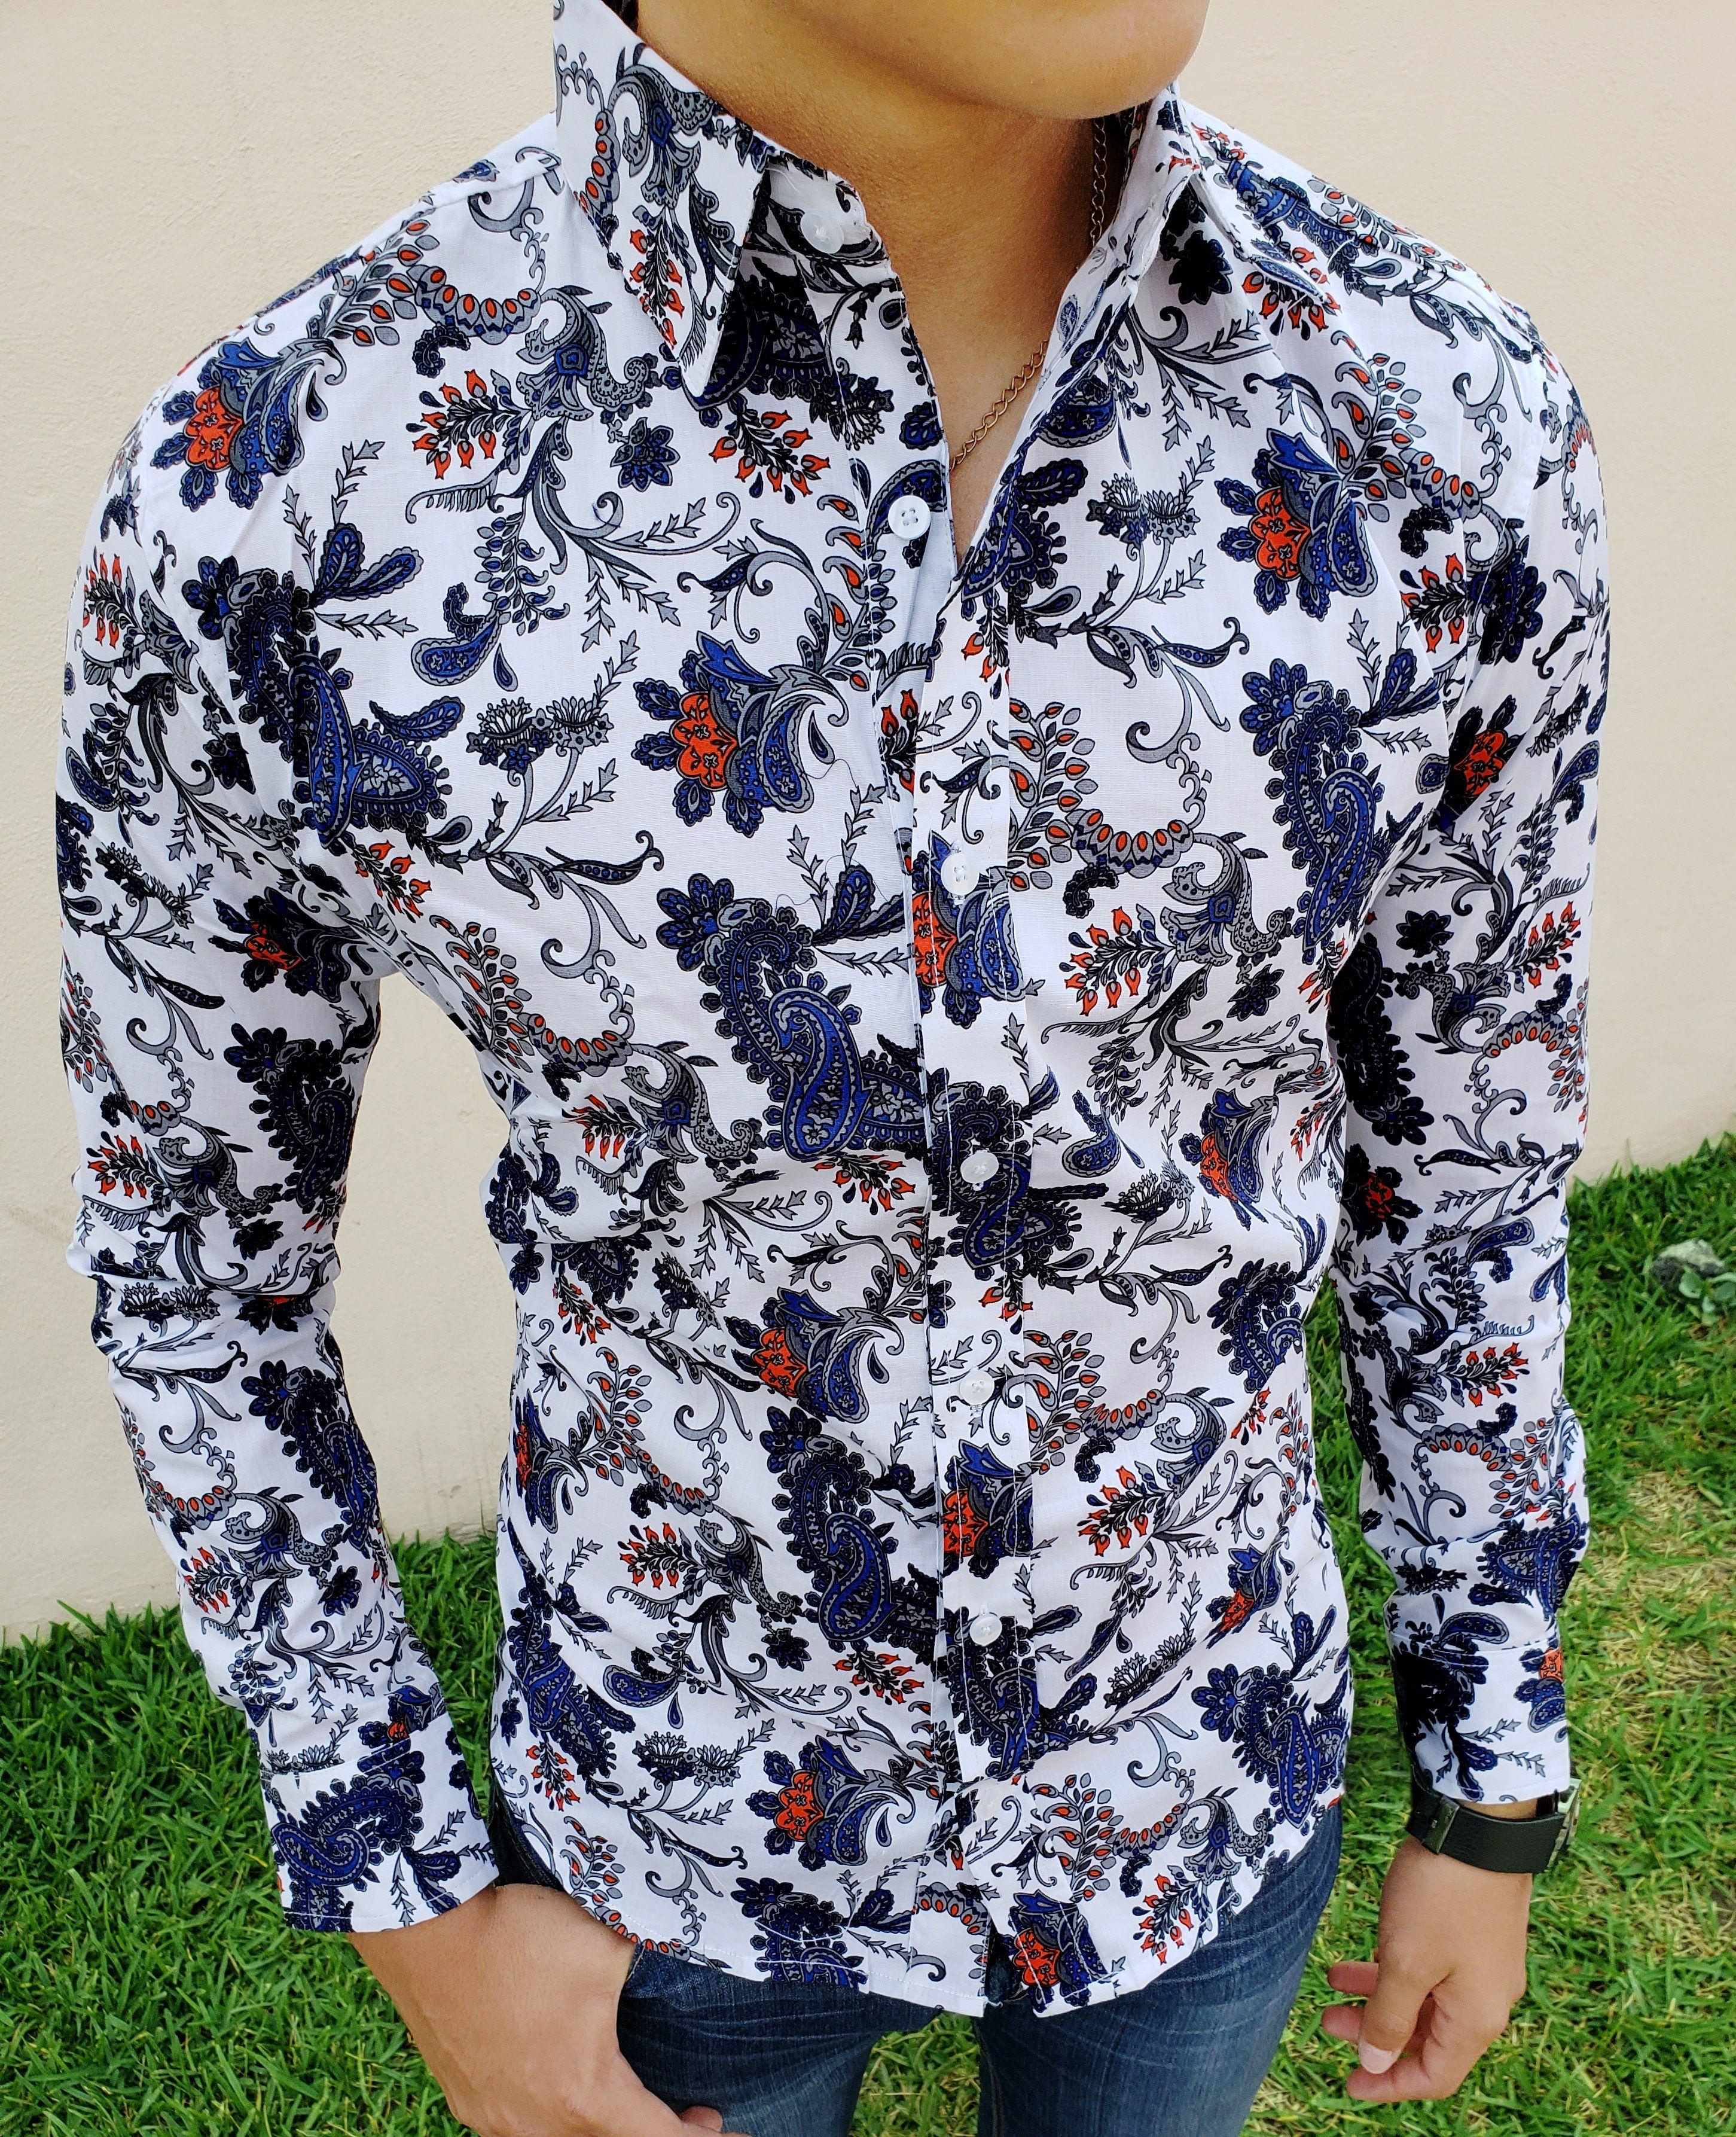 2fd7388ad57d3 Camisa blanca slim fit de hojas y flores azules para hombre en manga larga